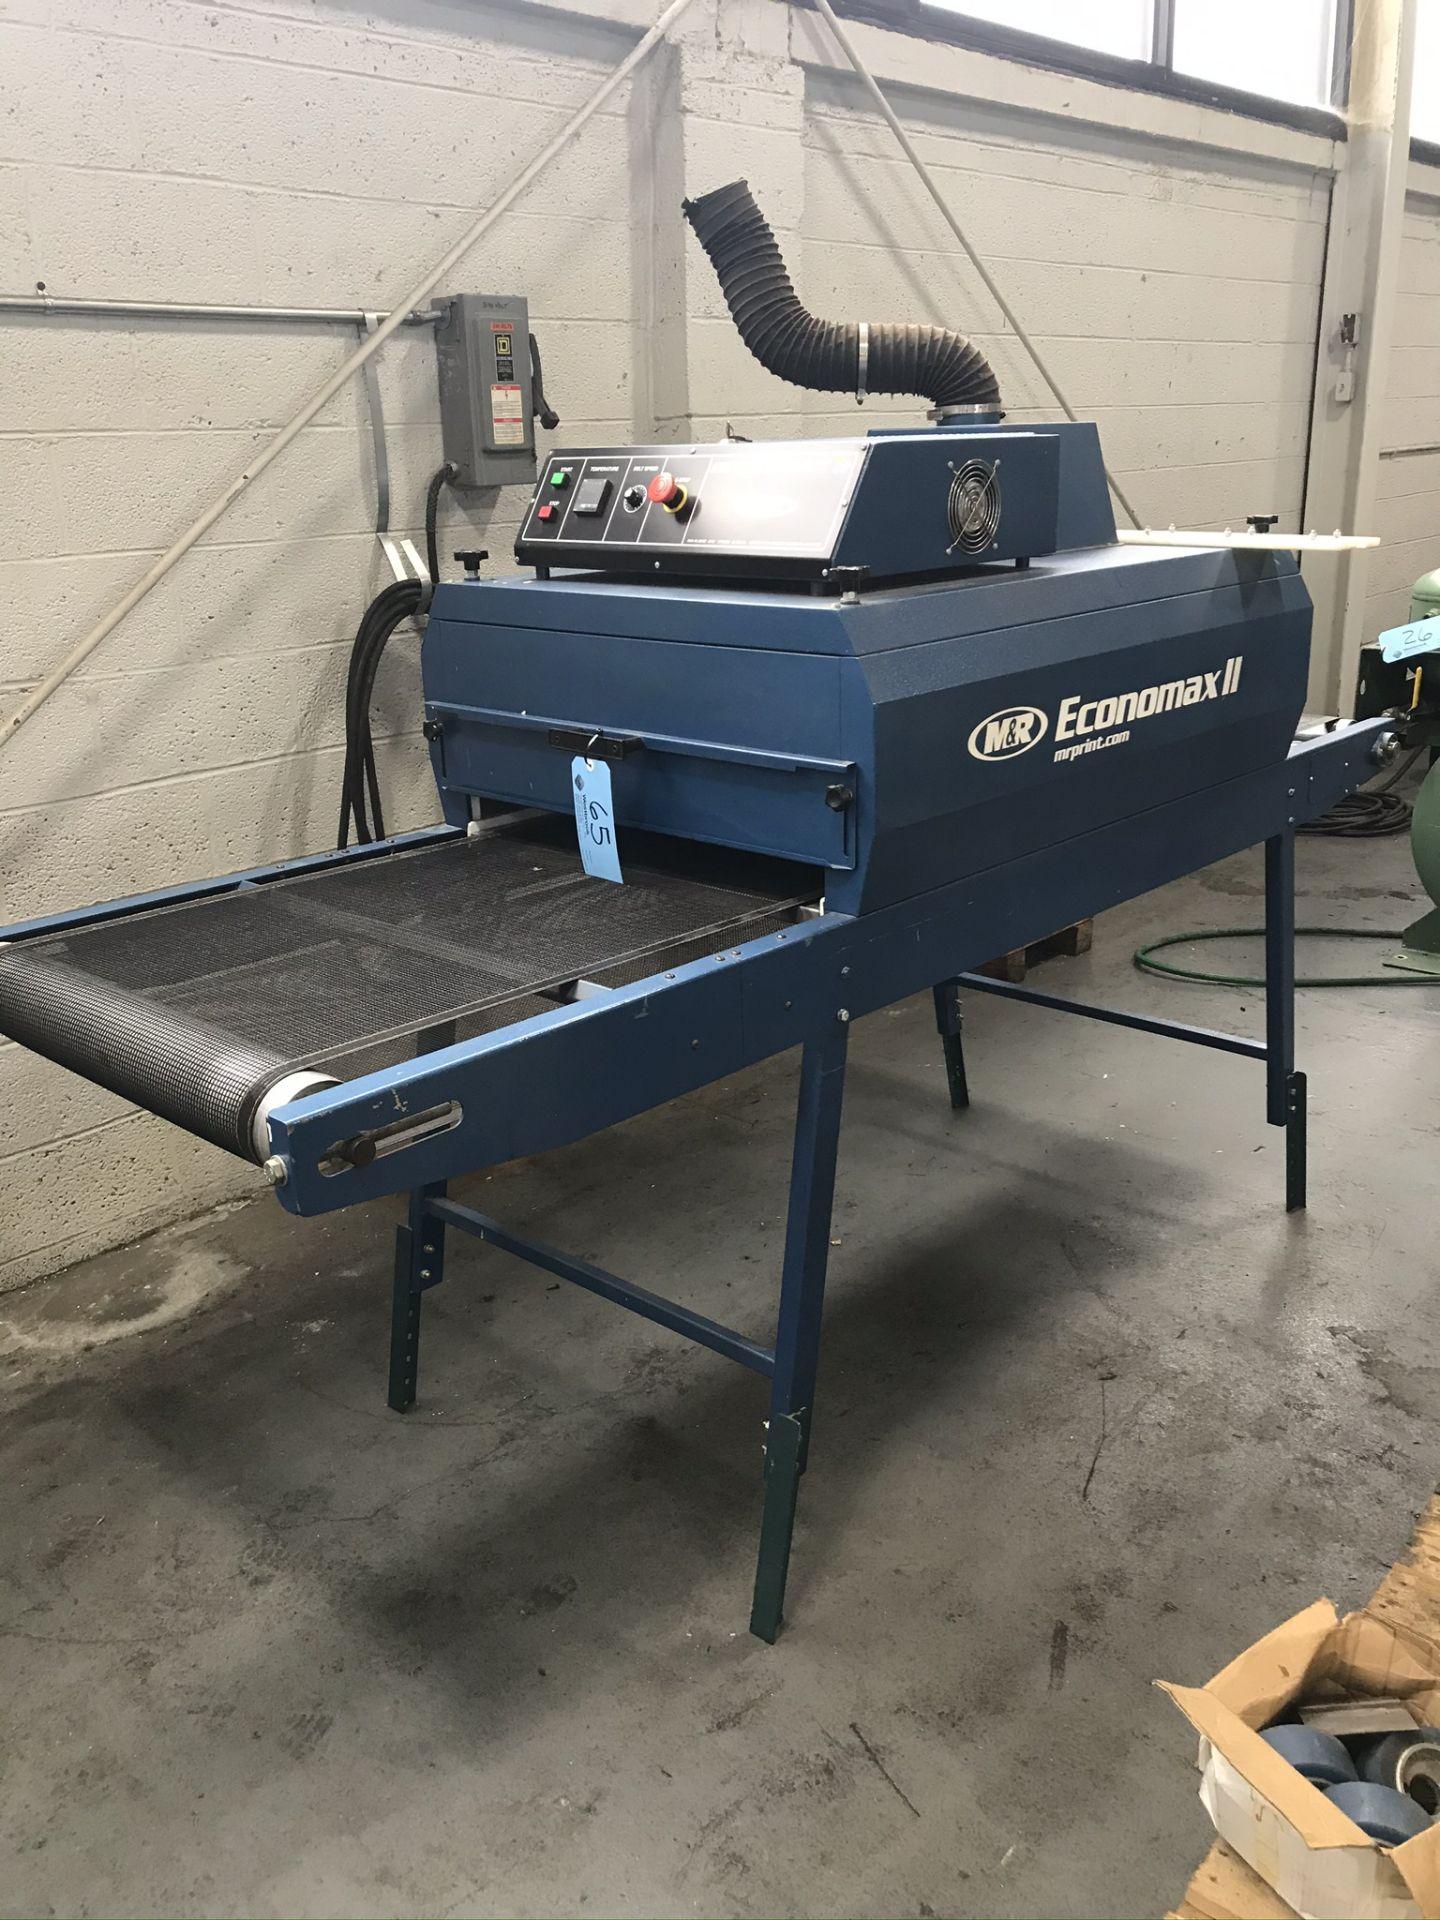 M&R Economax II ECMXII2432016A21 Drying Oven